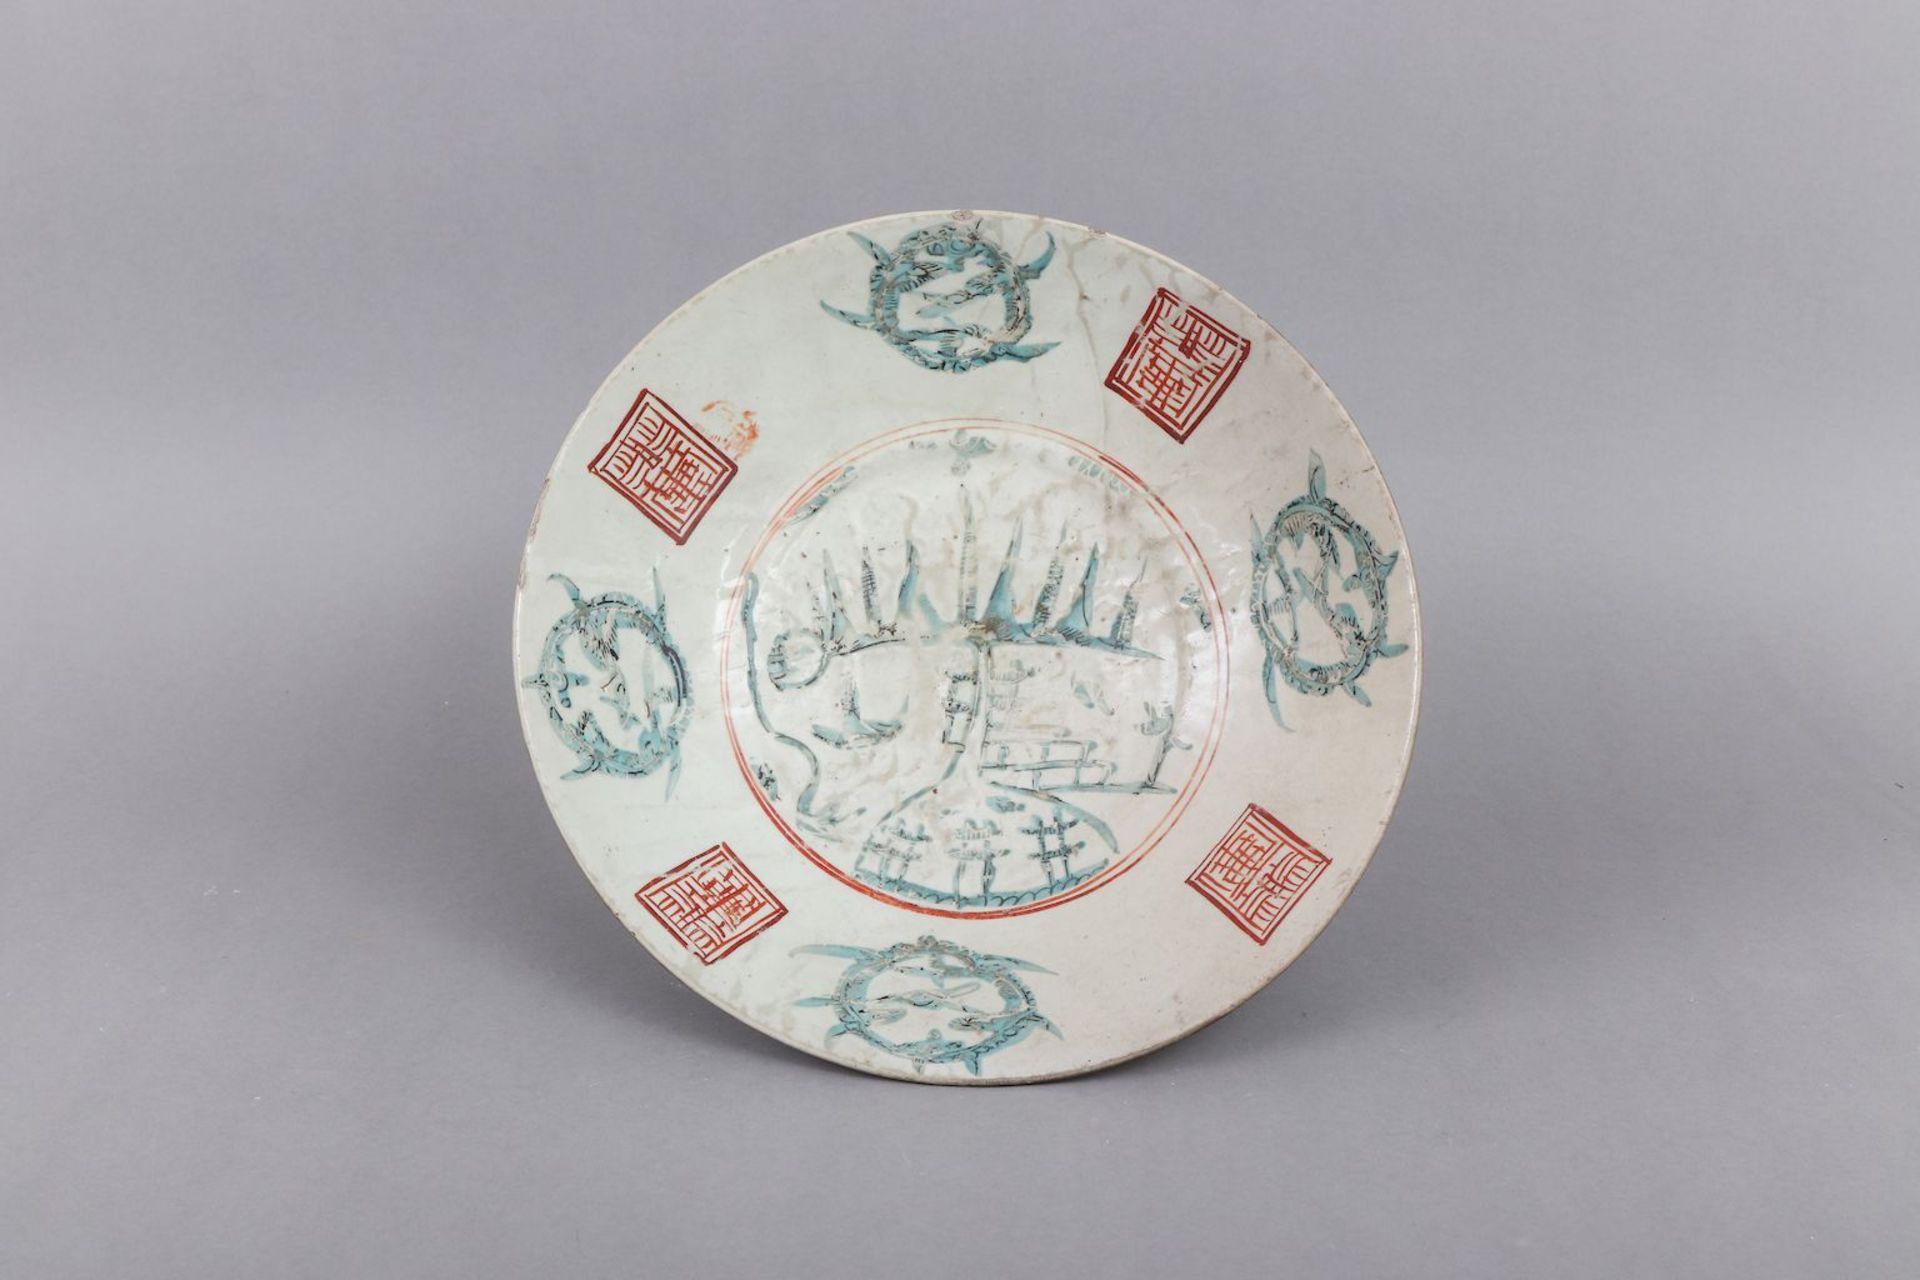 Chinesische Porzellanschale - Image 3 of 4